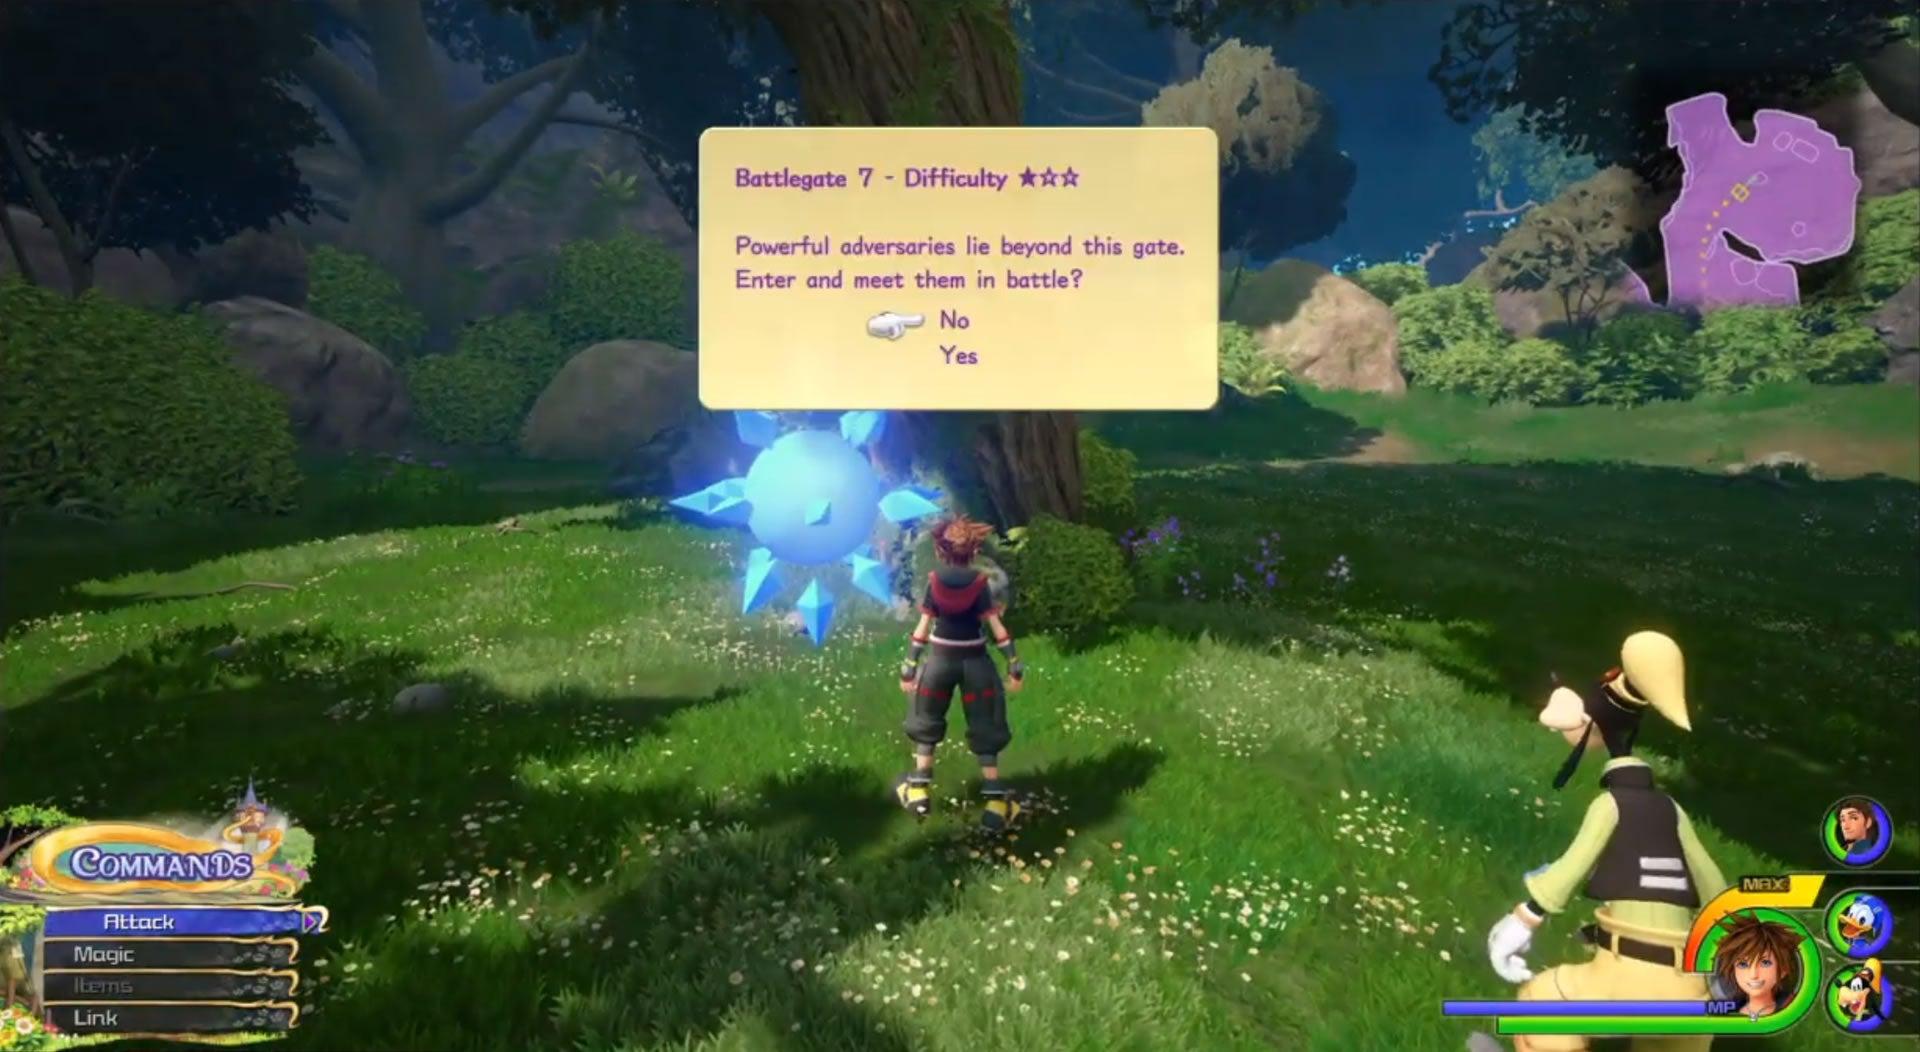 Image for Kingdom Hearts 3 Battlegates: battlegate locations for every combat challenge